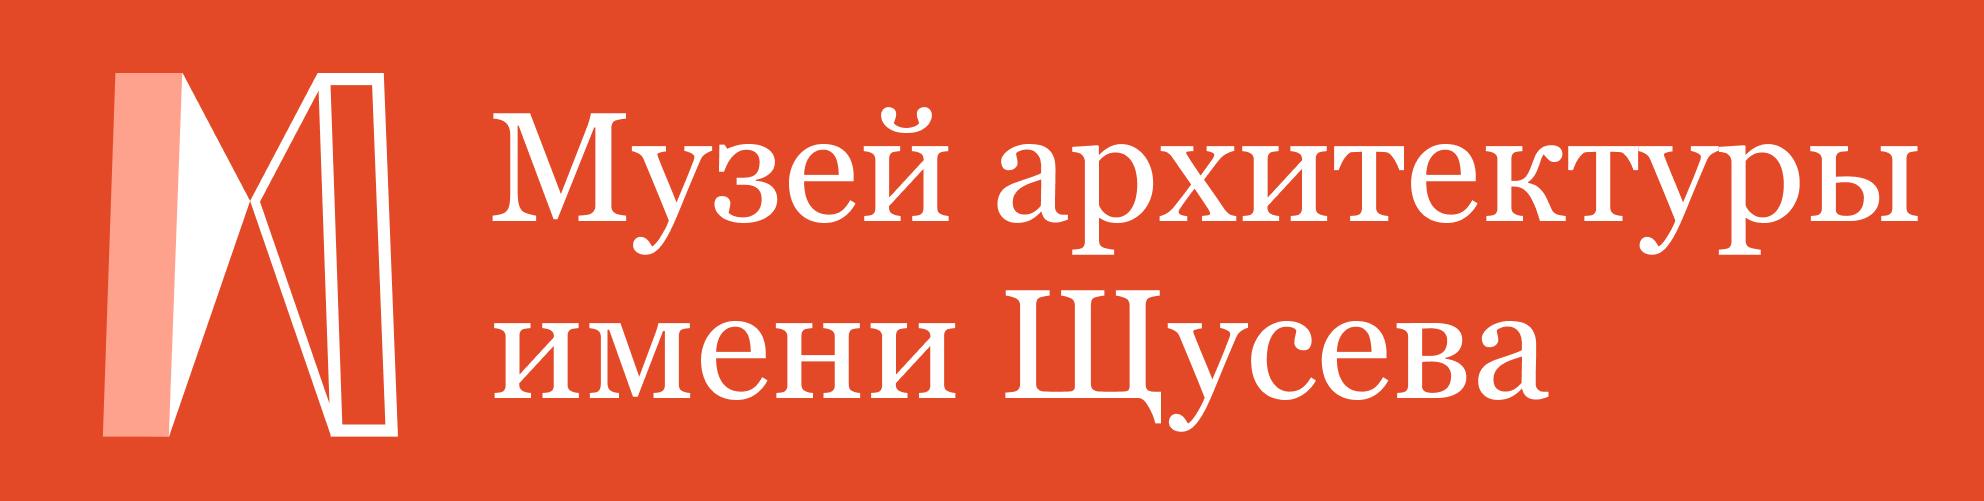 Логотип.